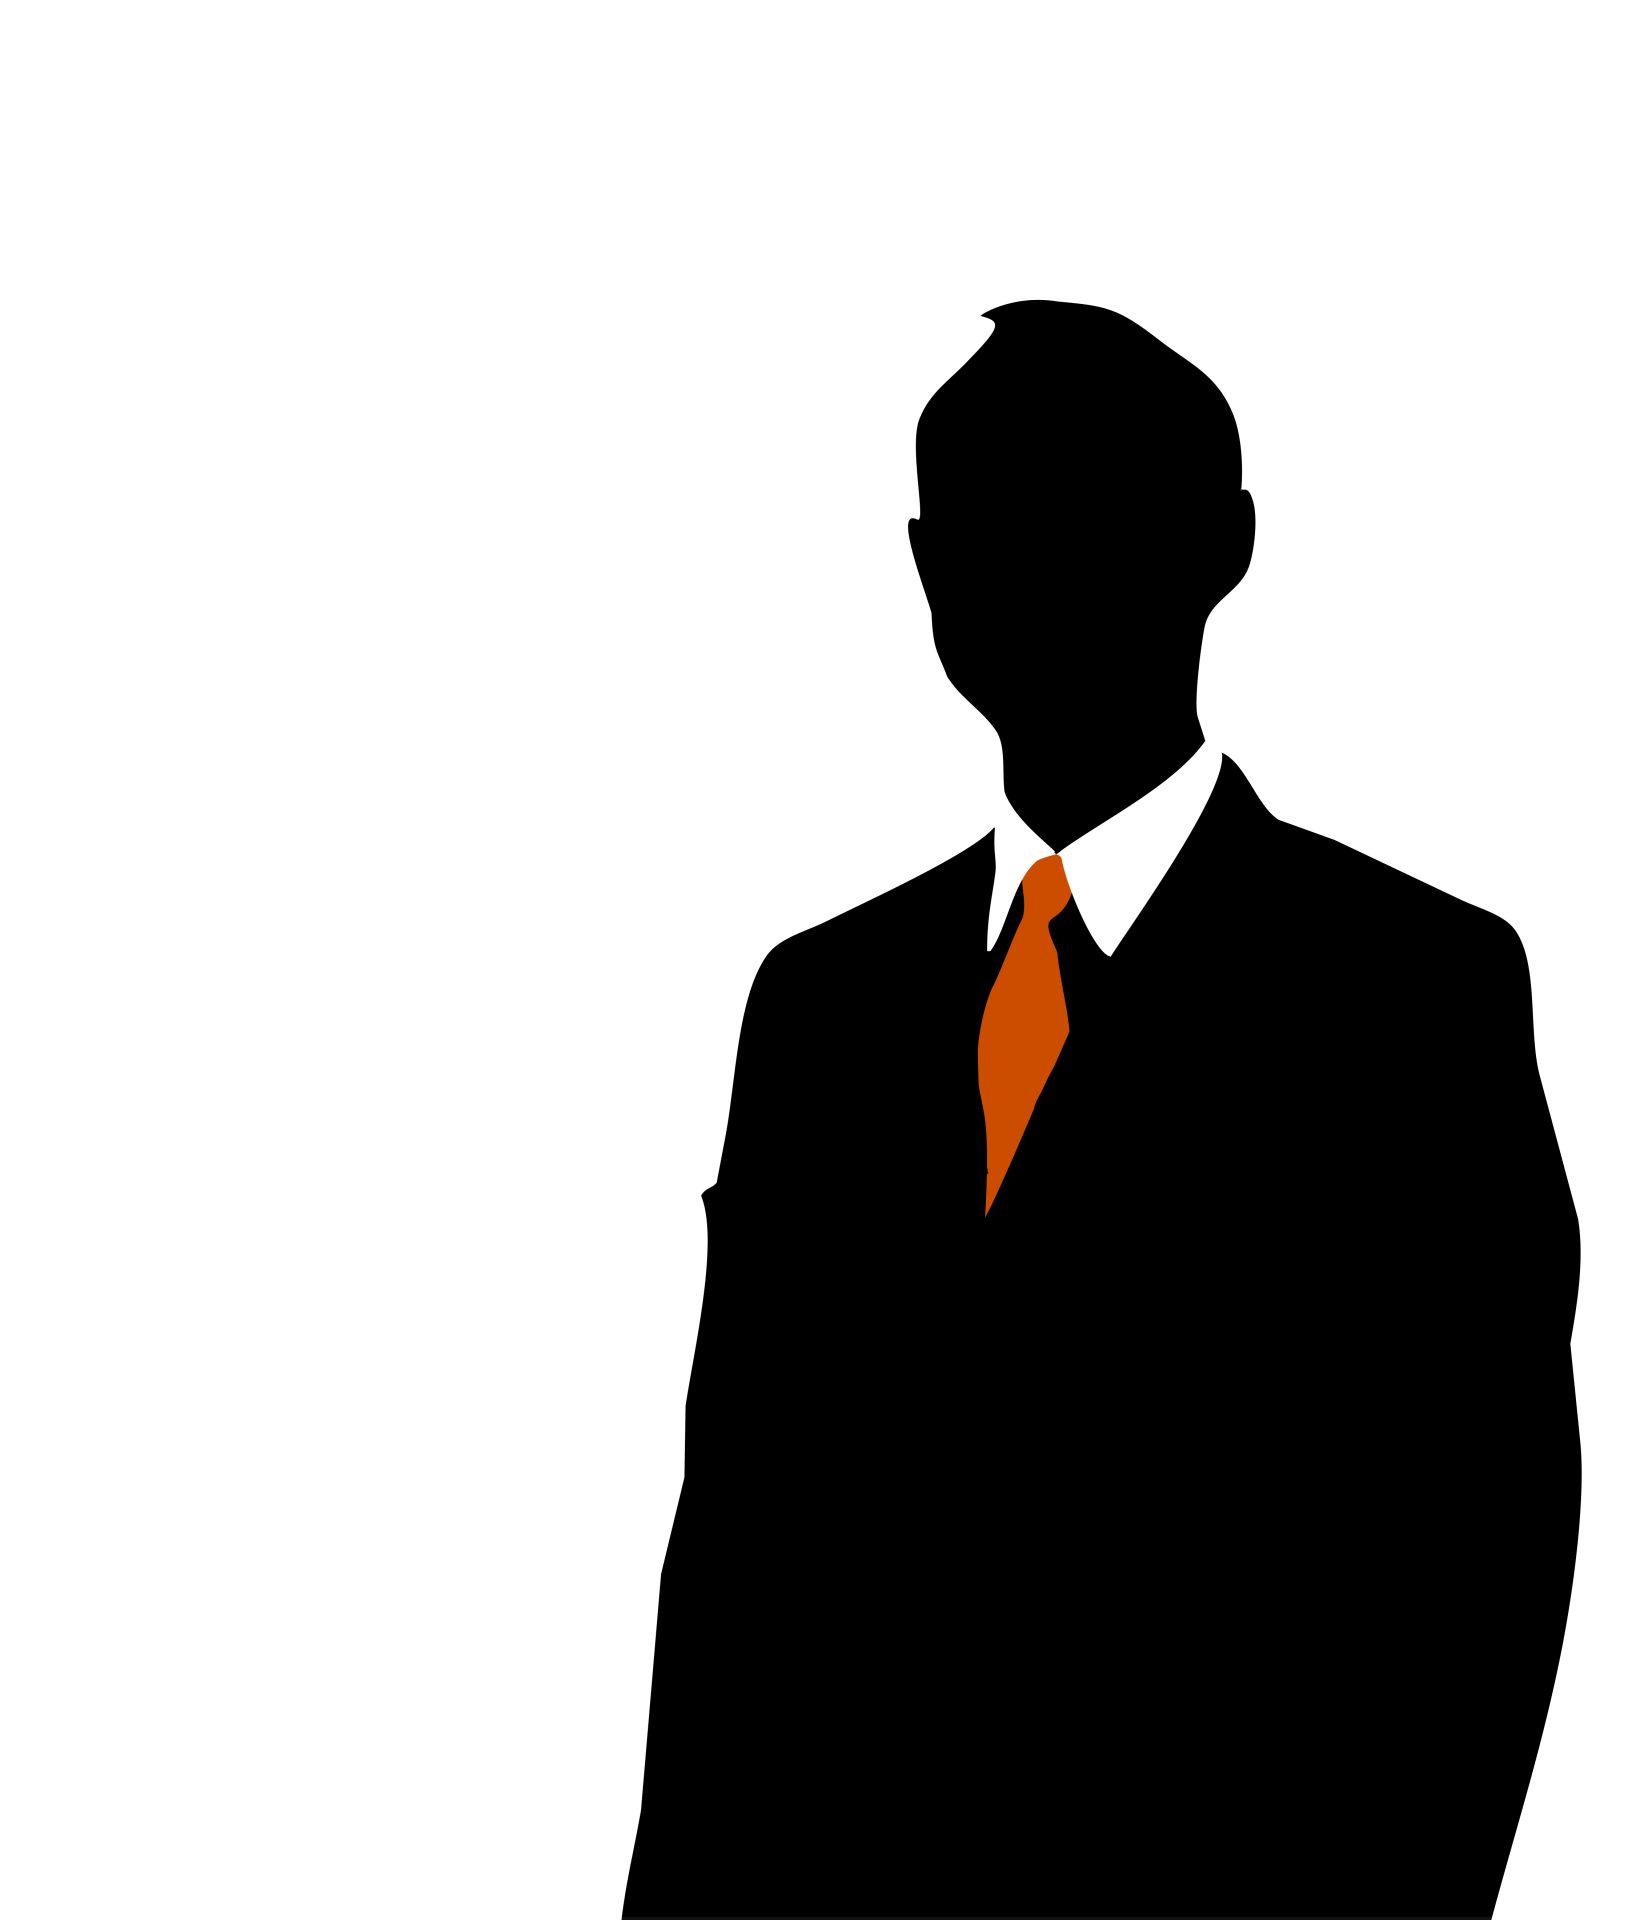 ESEMPI DI INDAGINE PER AFFIDABILITÀ DIPENDENTI E MANAGER